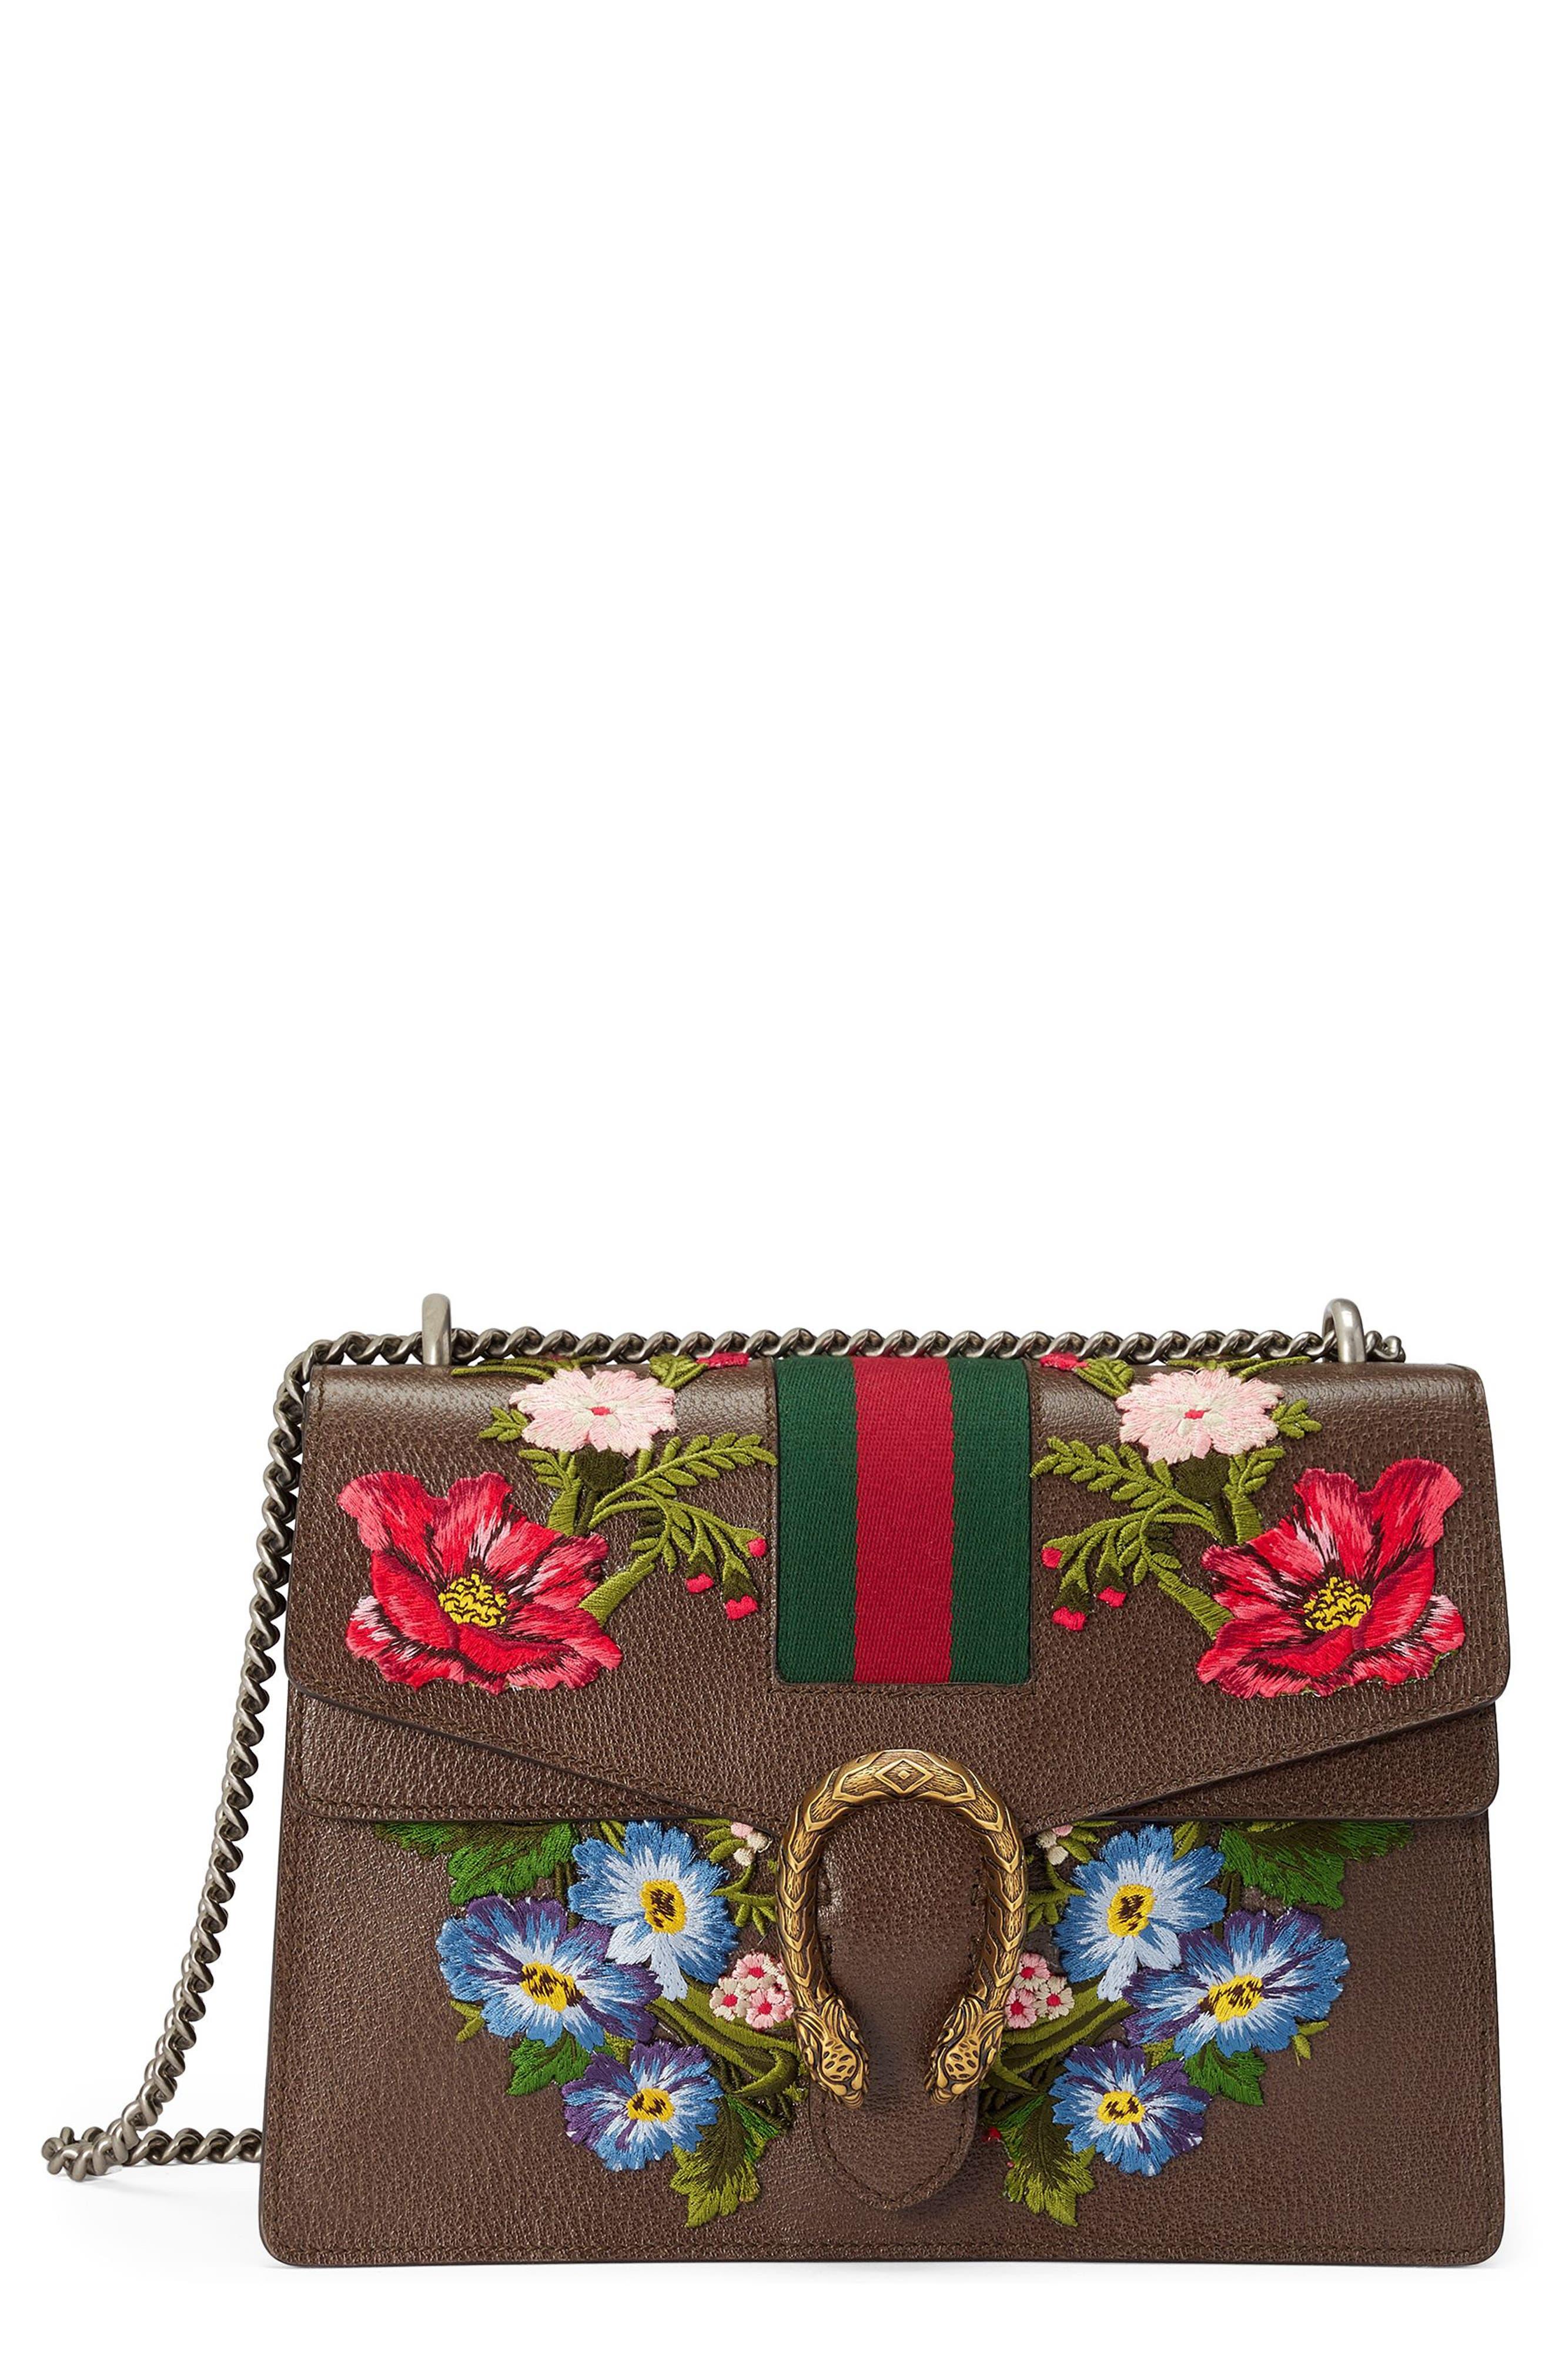 Alternate Image 1 Selected - Gucci Medium Dionysus Embroidered Leather Shoulder Bag